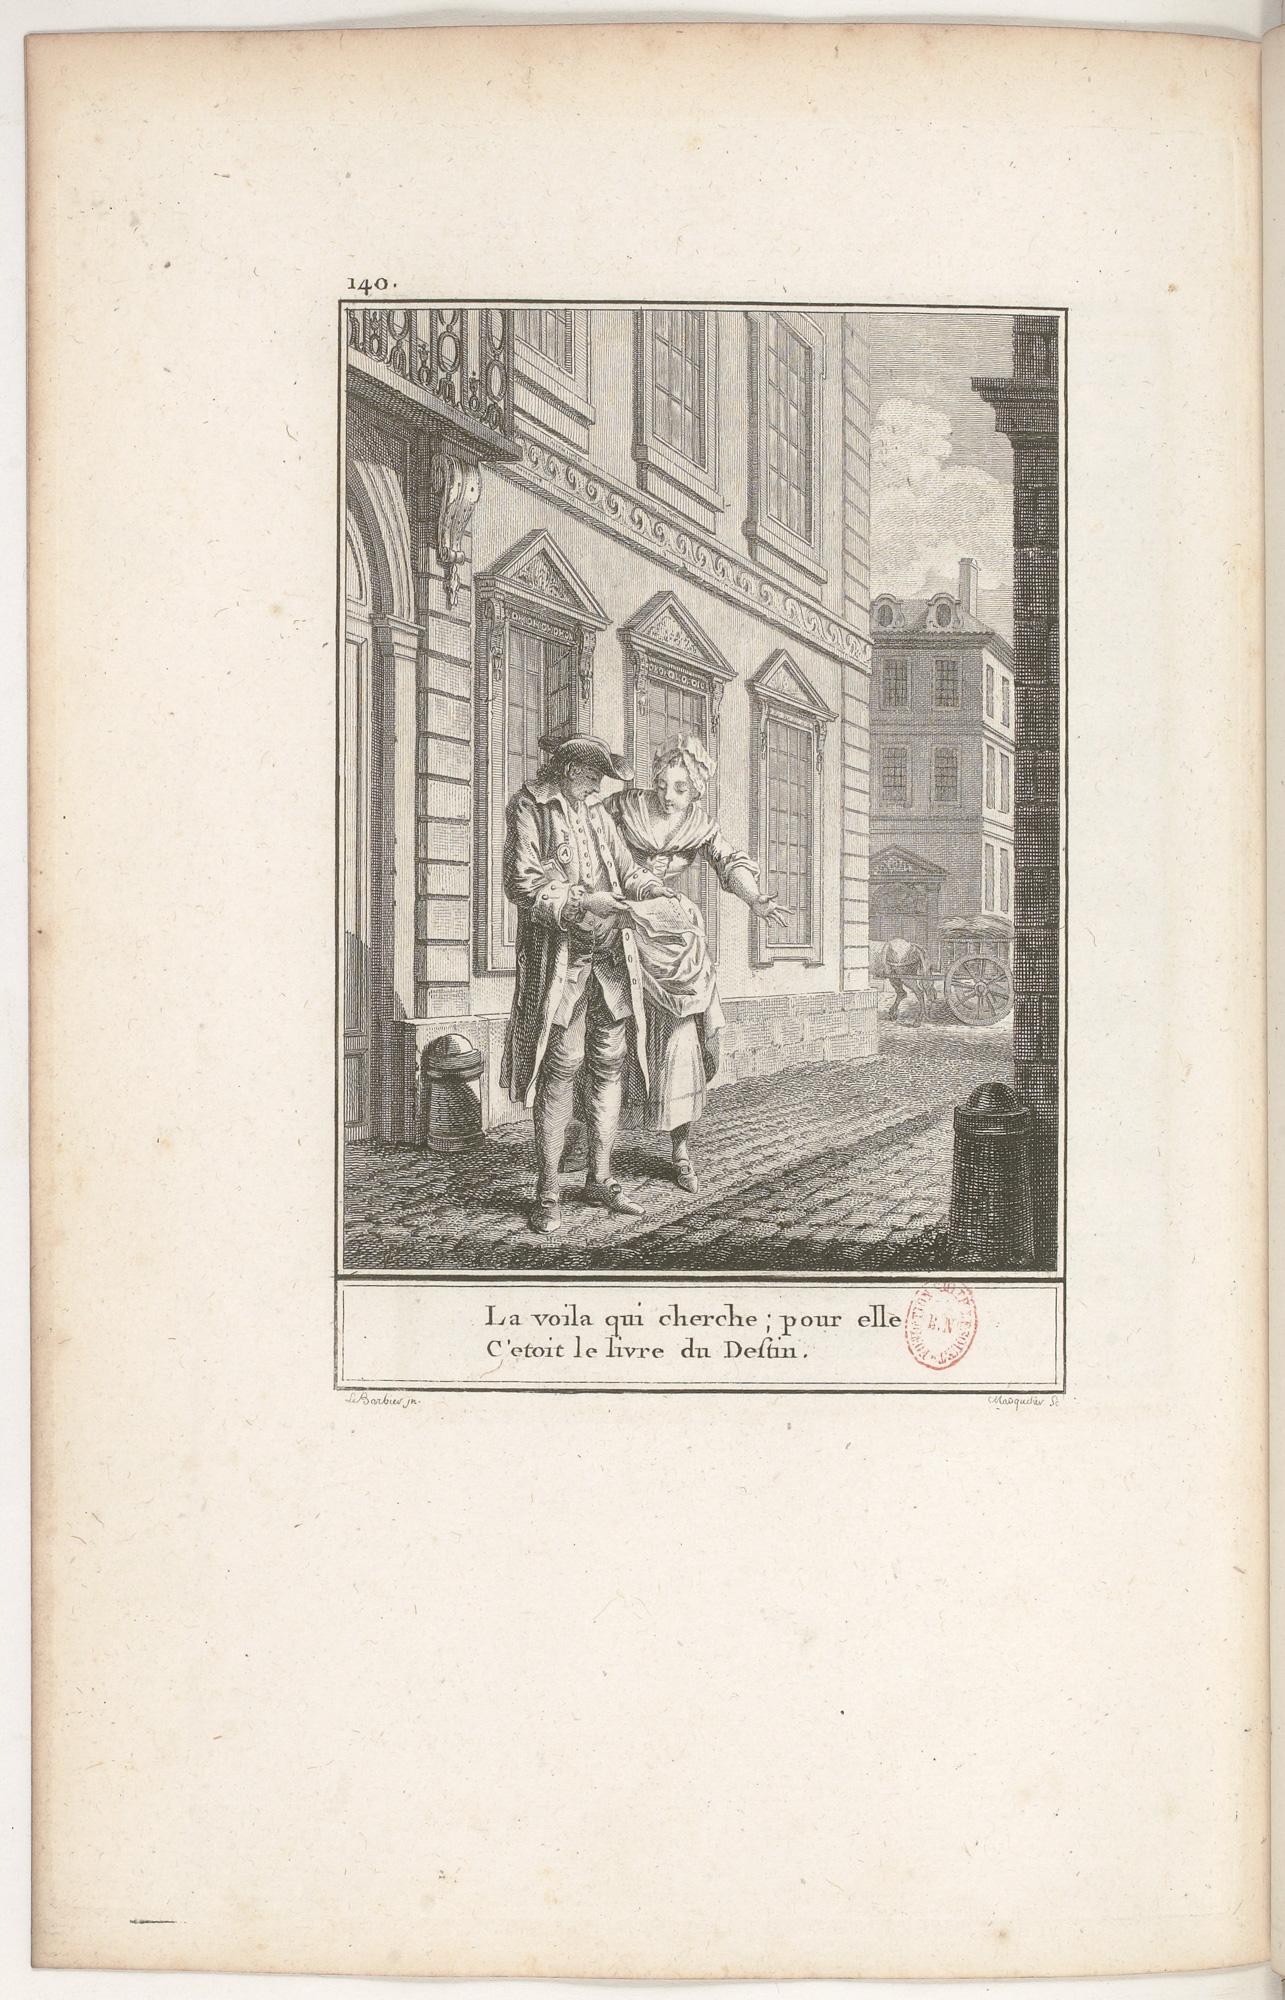 S.4.24 L'heureuse loterie, 1772, Image